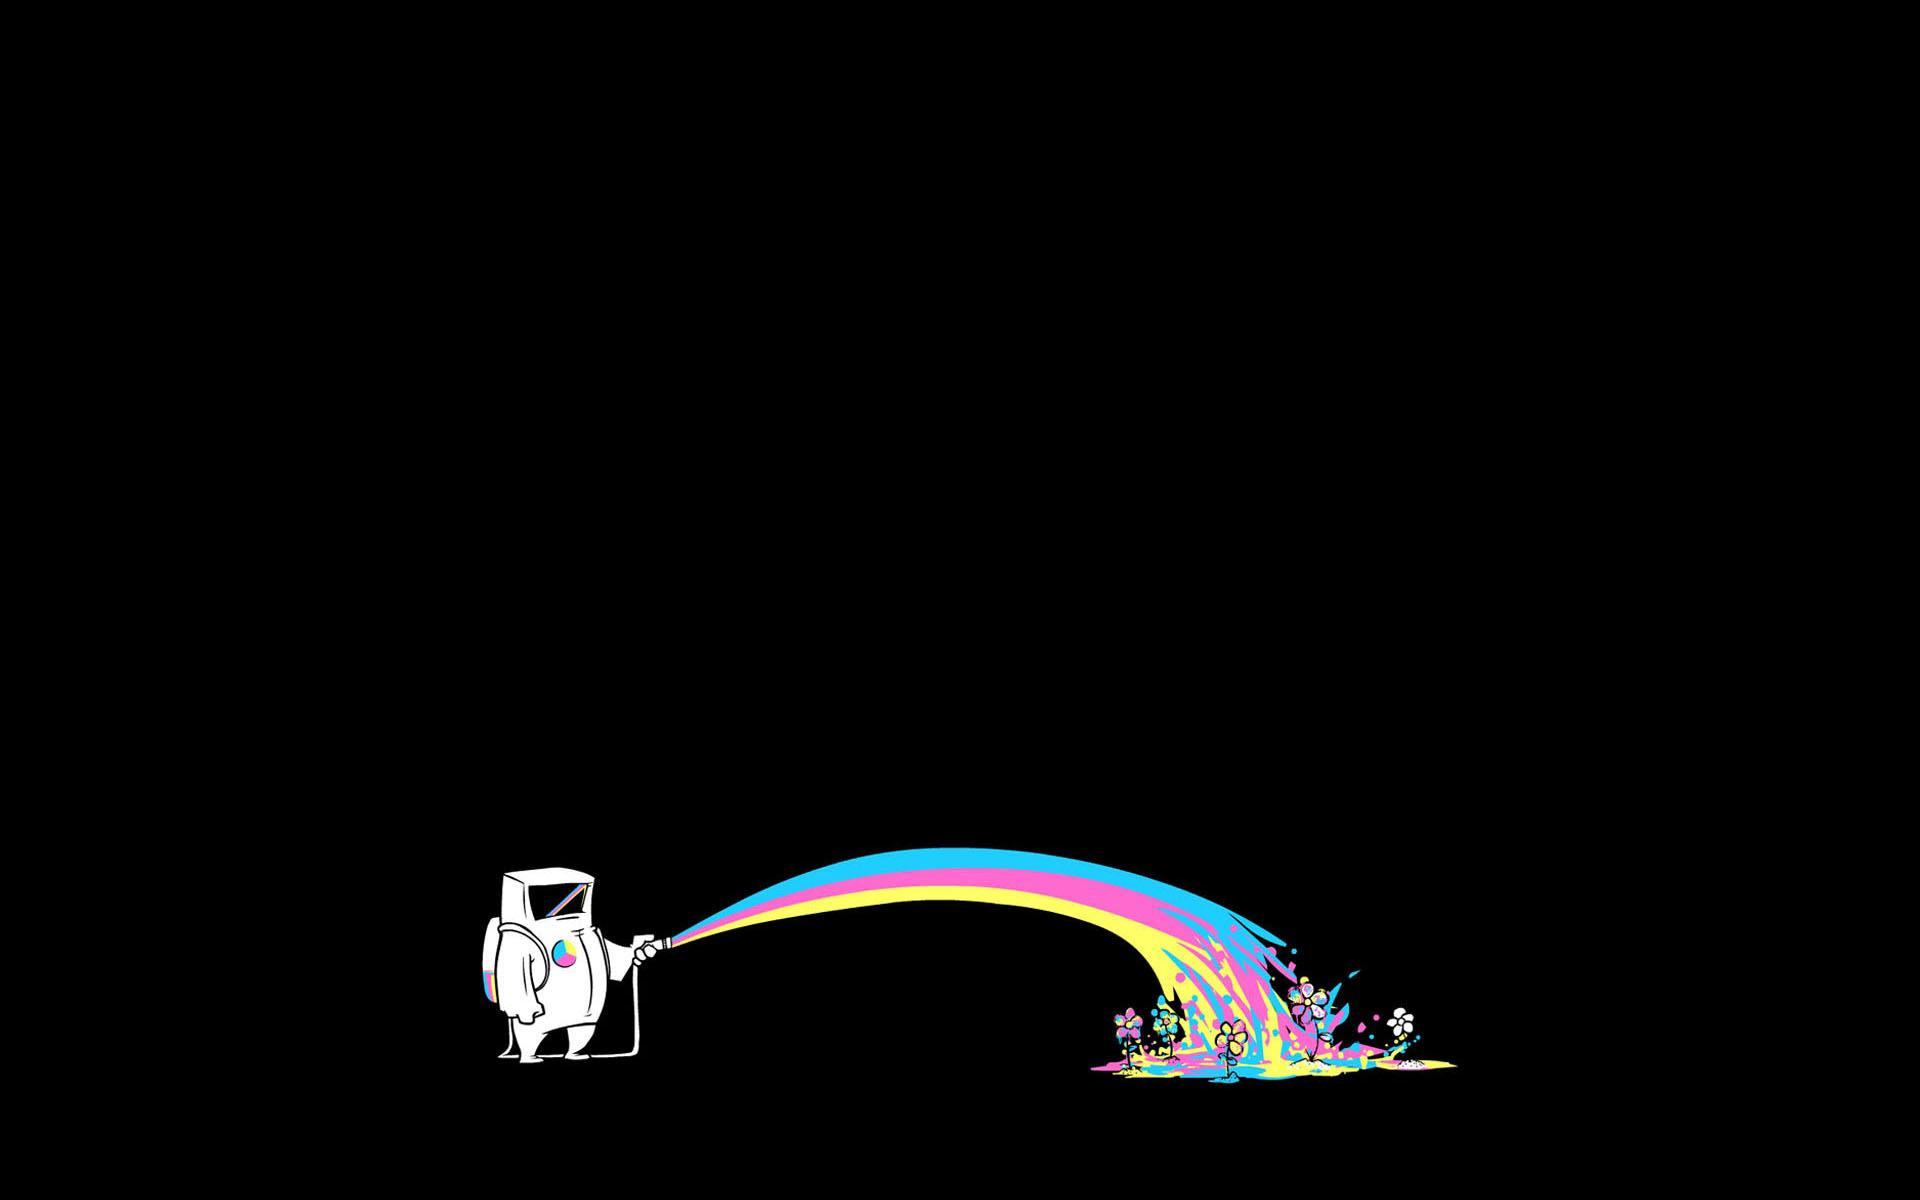 Free Download Minimalistic Rainbows Rainbow Minimalist Hd Wallpaper Of Nature 1920x1200 For Your Desktop Mobile Tablet Explore 49 Hd Minimalist Wallpaper 1080p Minimalist Wallpaper Free Desktop Wallpaper Designs Minimalist Explore and download tons of high quality 1920x1080 wallpapers all for free! desktop wallpaper designs minimalist